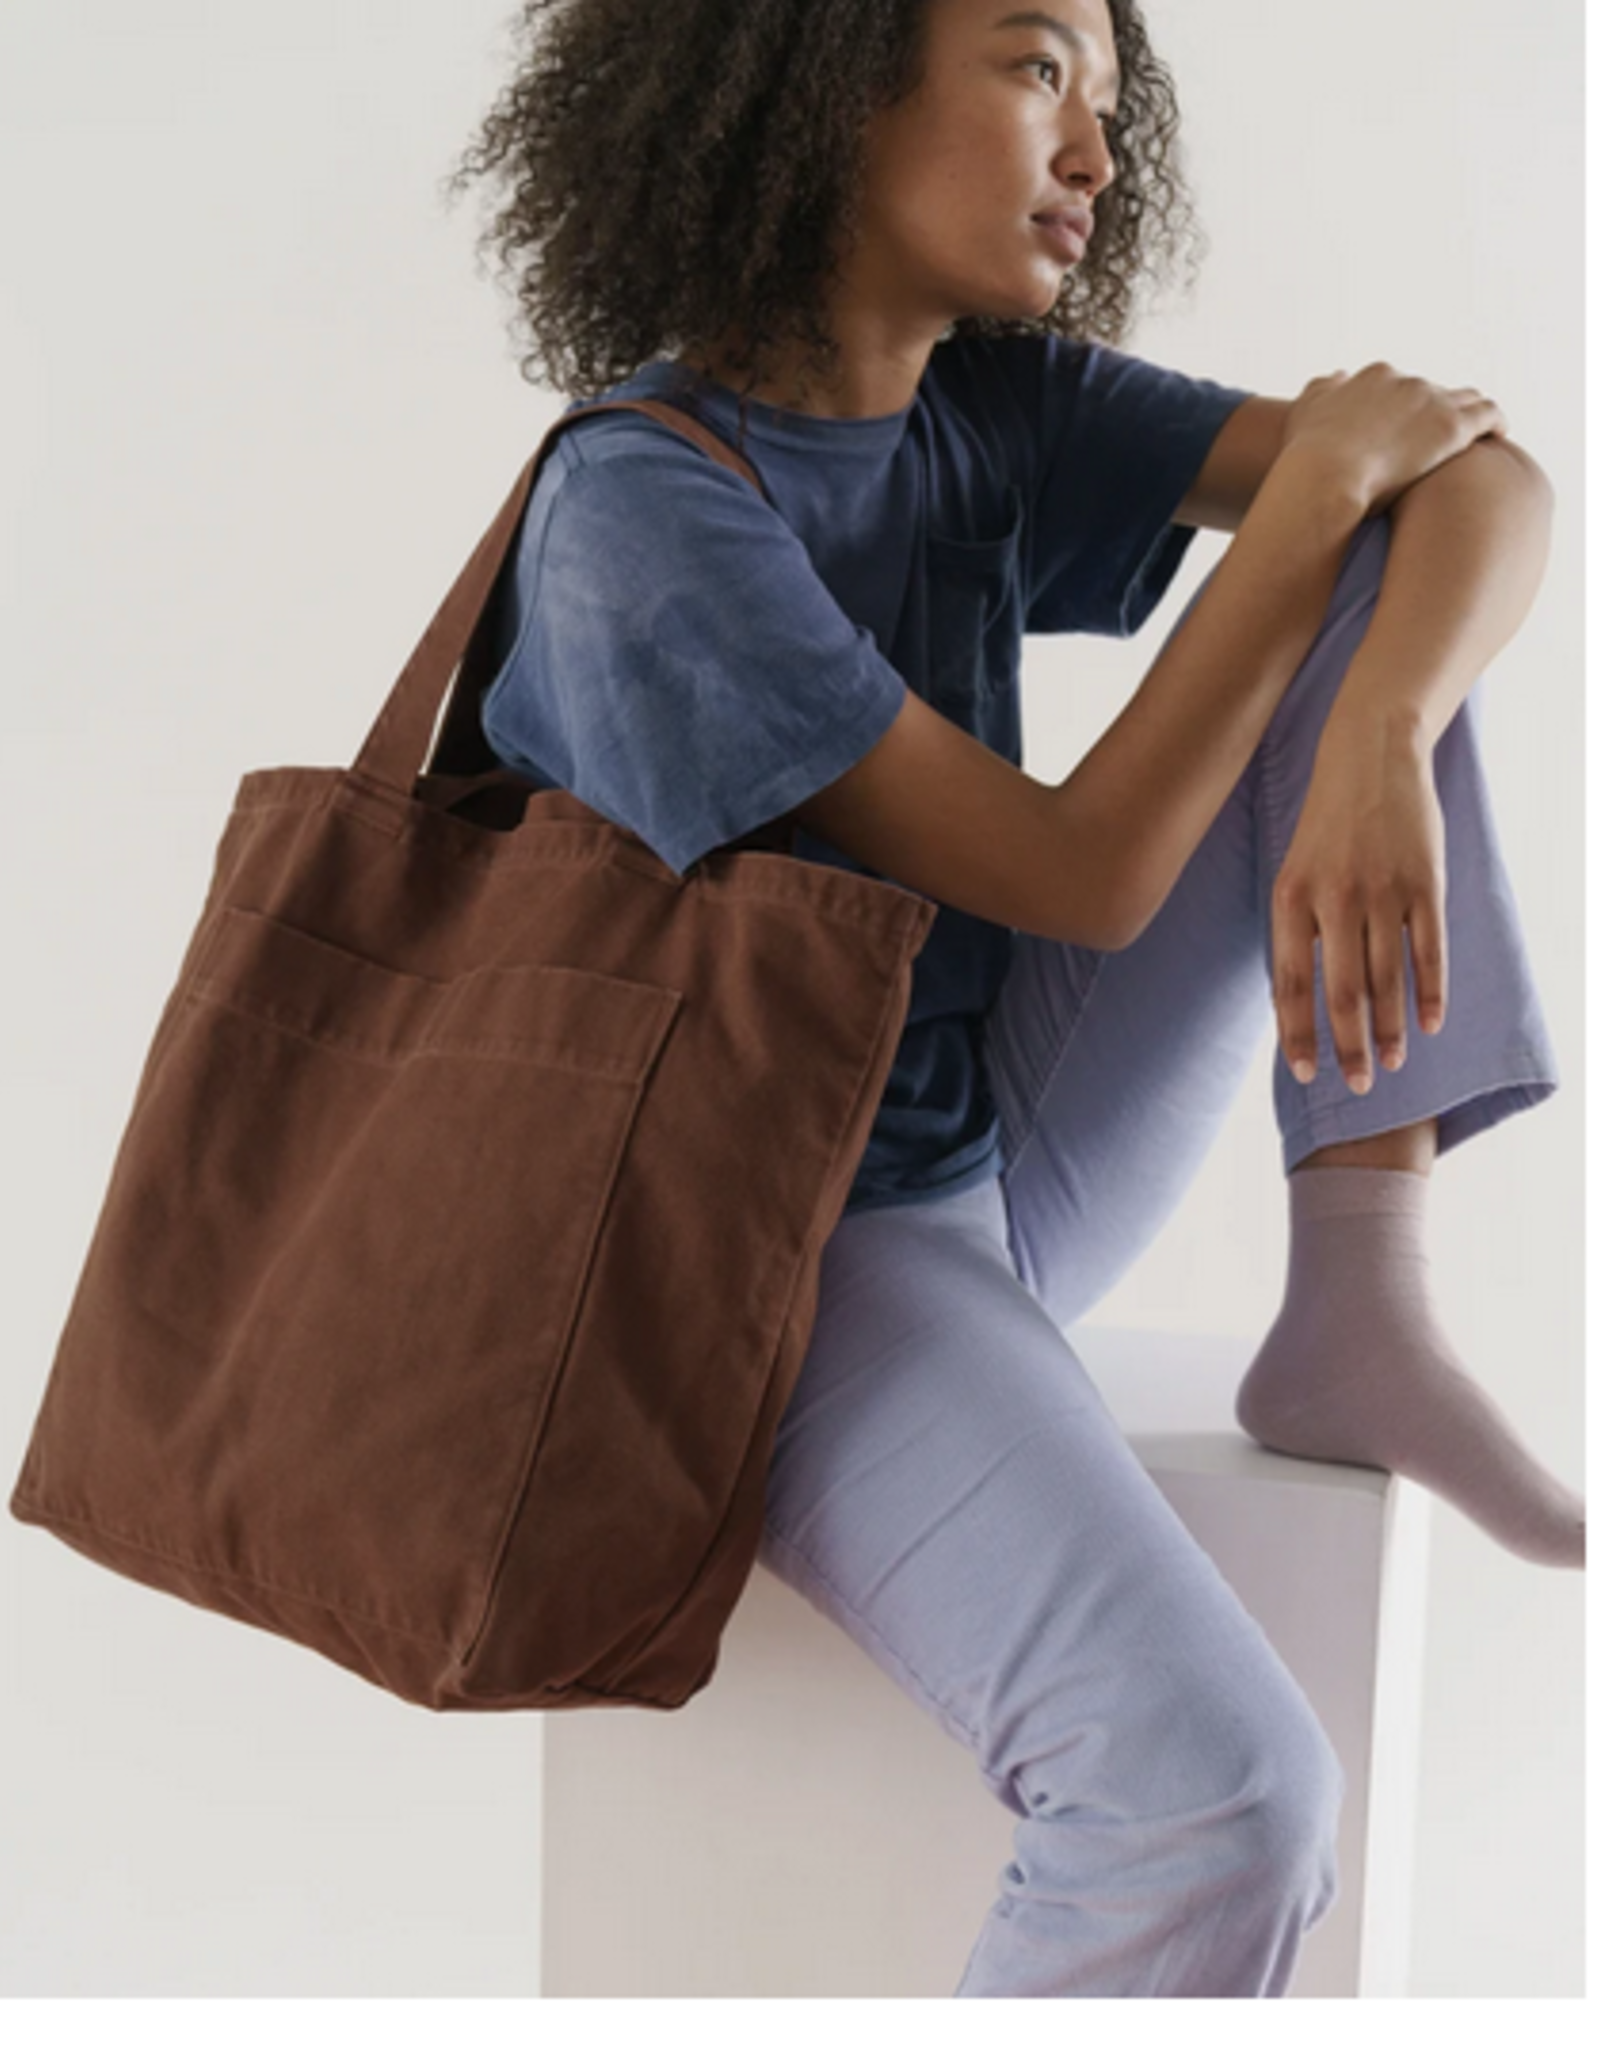 Baggu Giant pocket tote washed brown